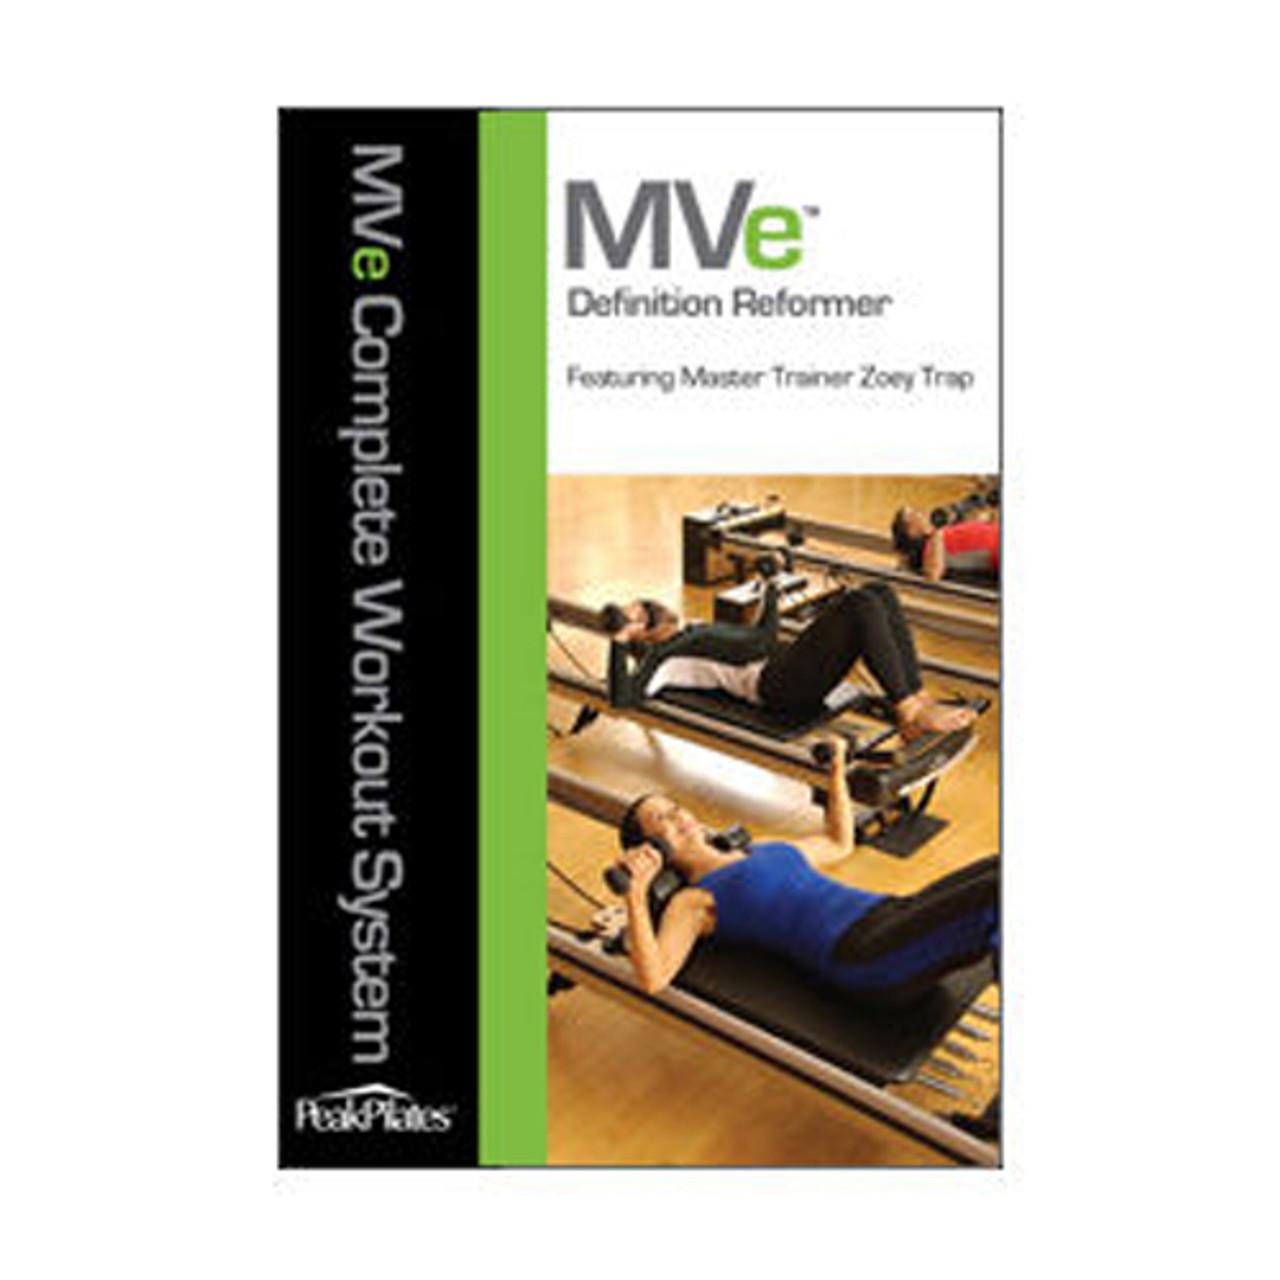 MVe® Definition Reformer Workout DVD